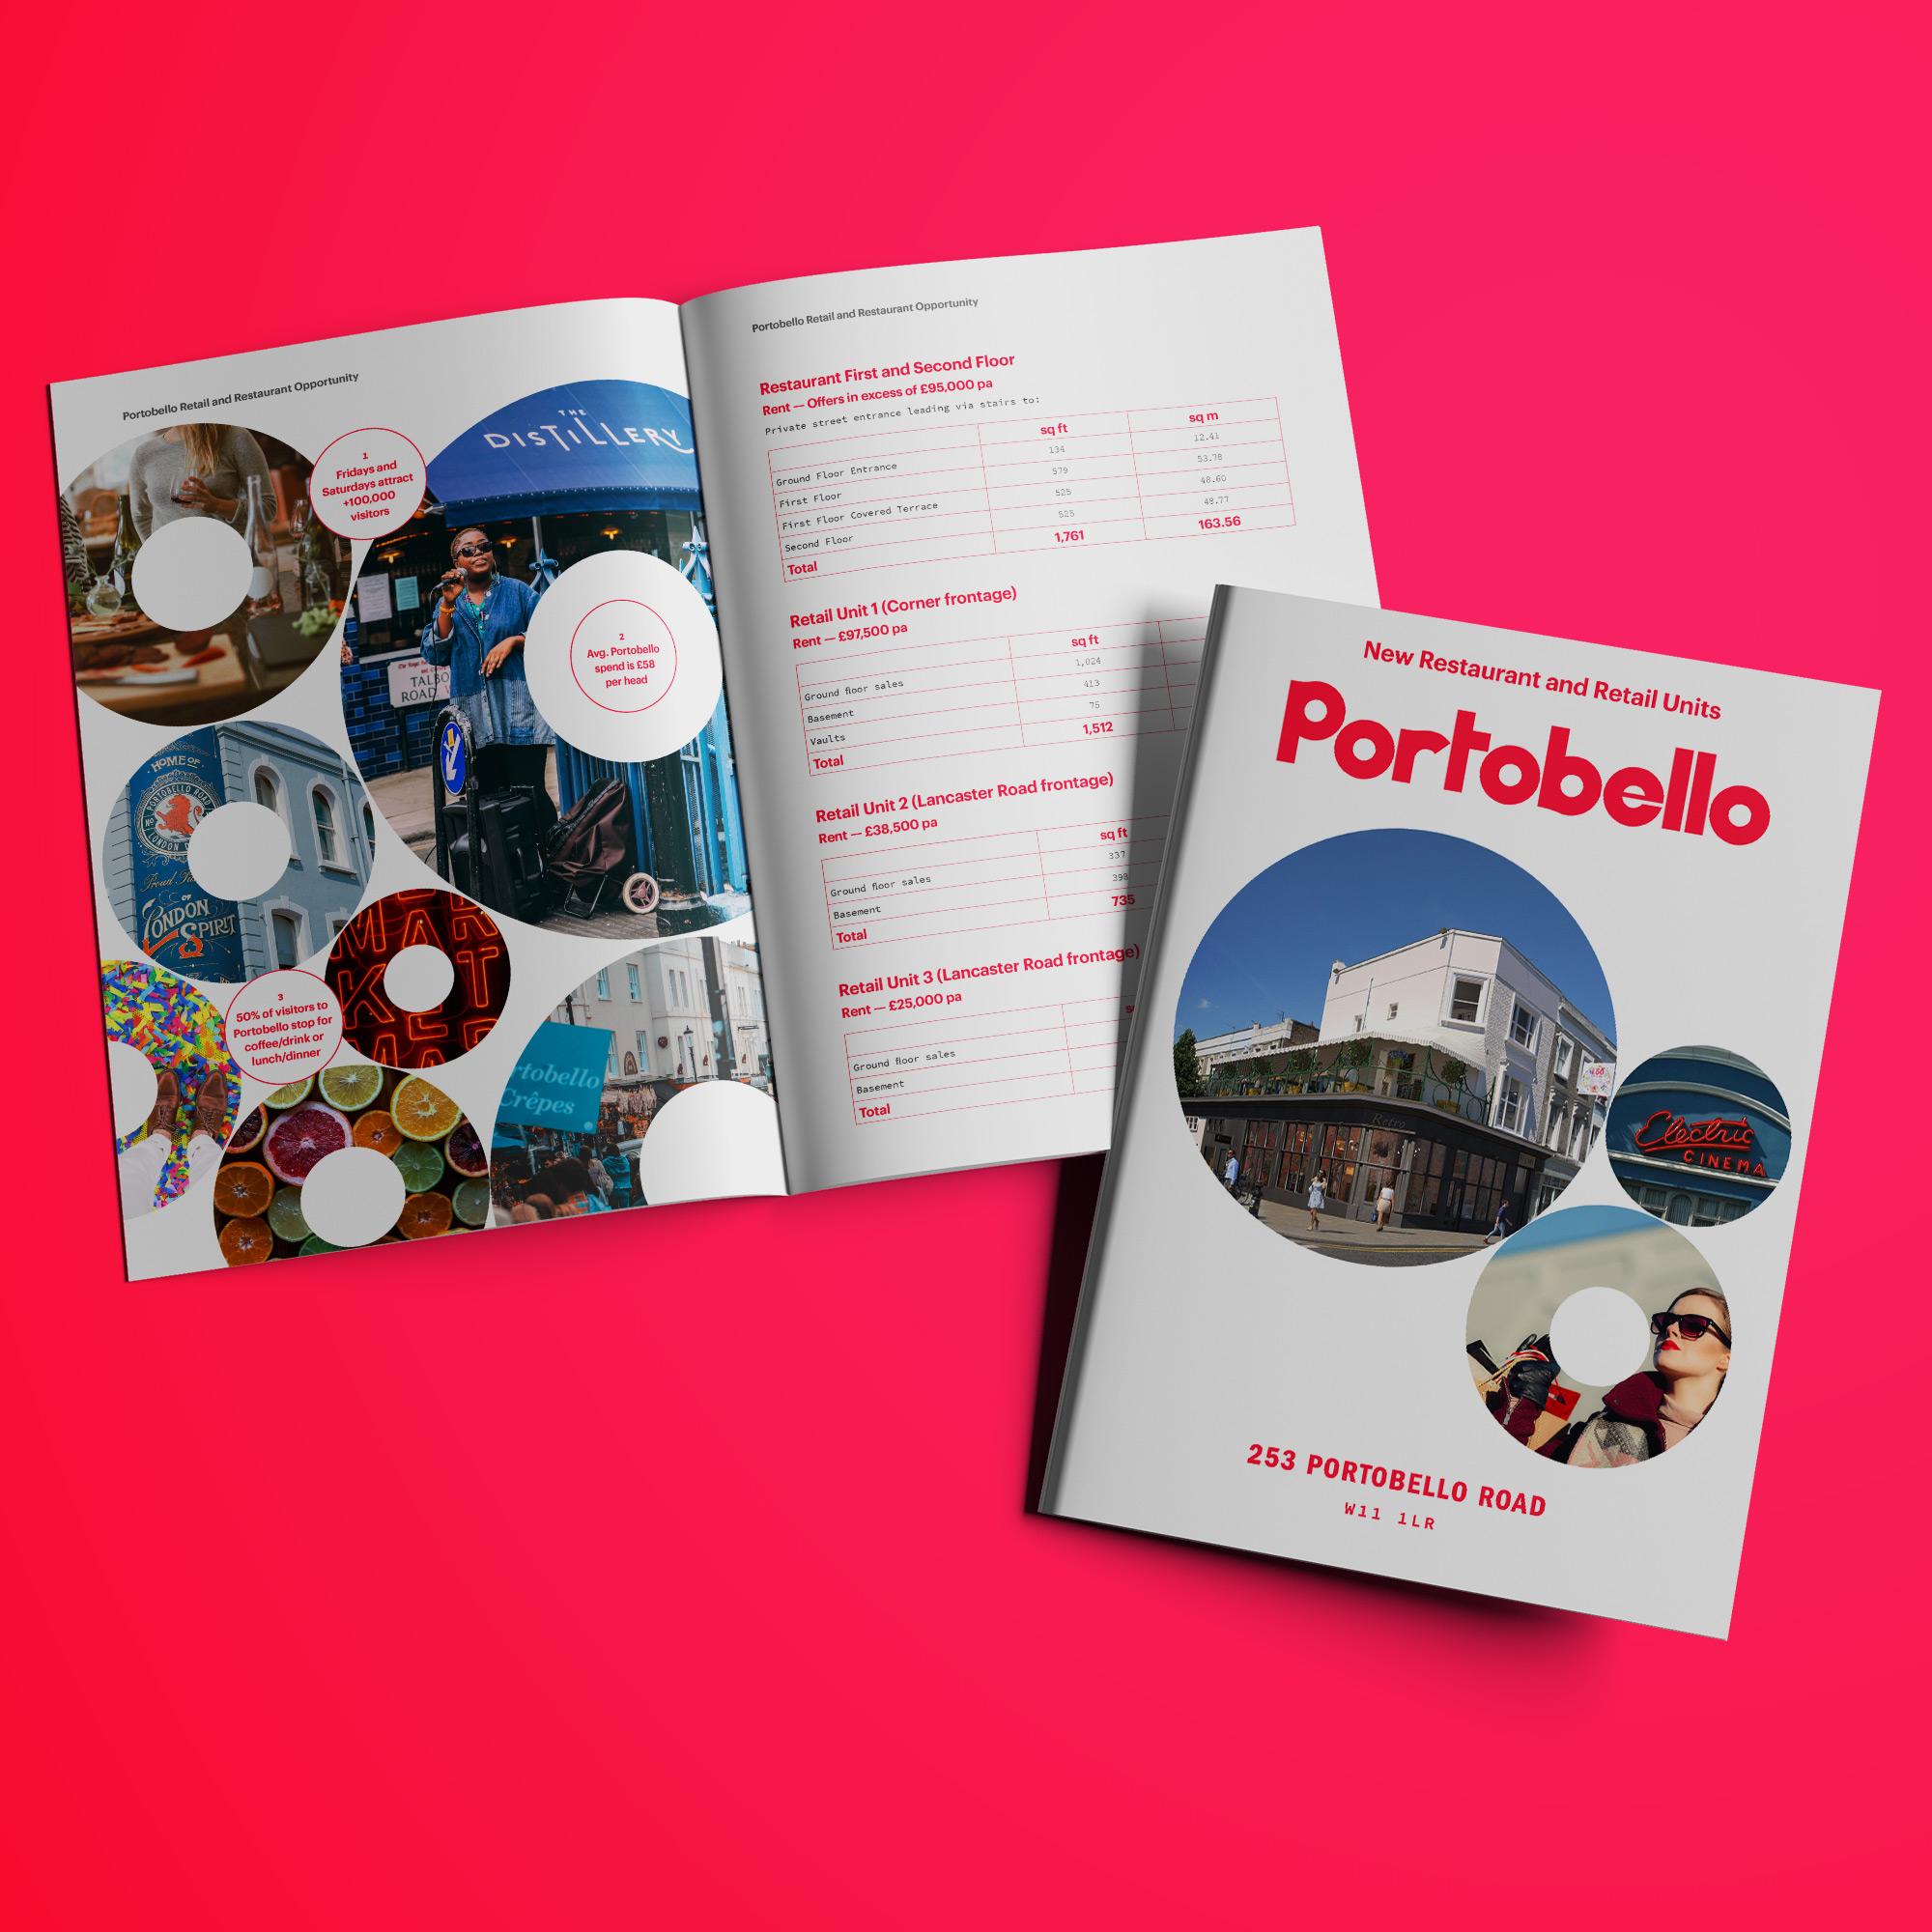 portobello-A4-by-ALSO-Agency-01.jpg